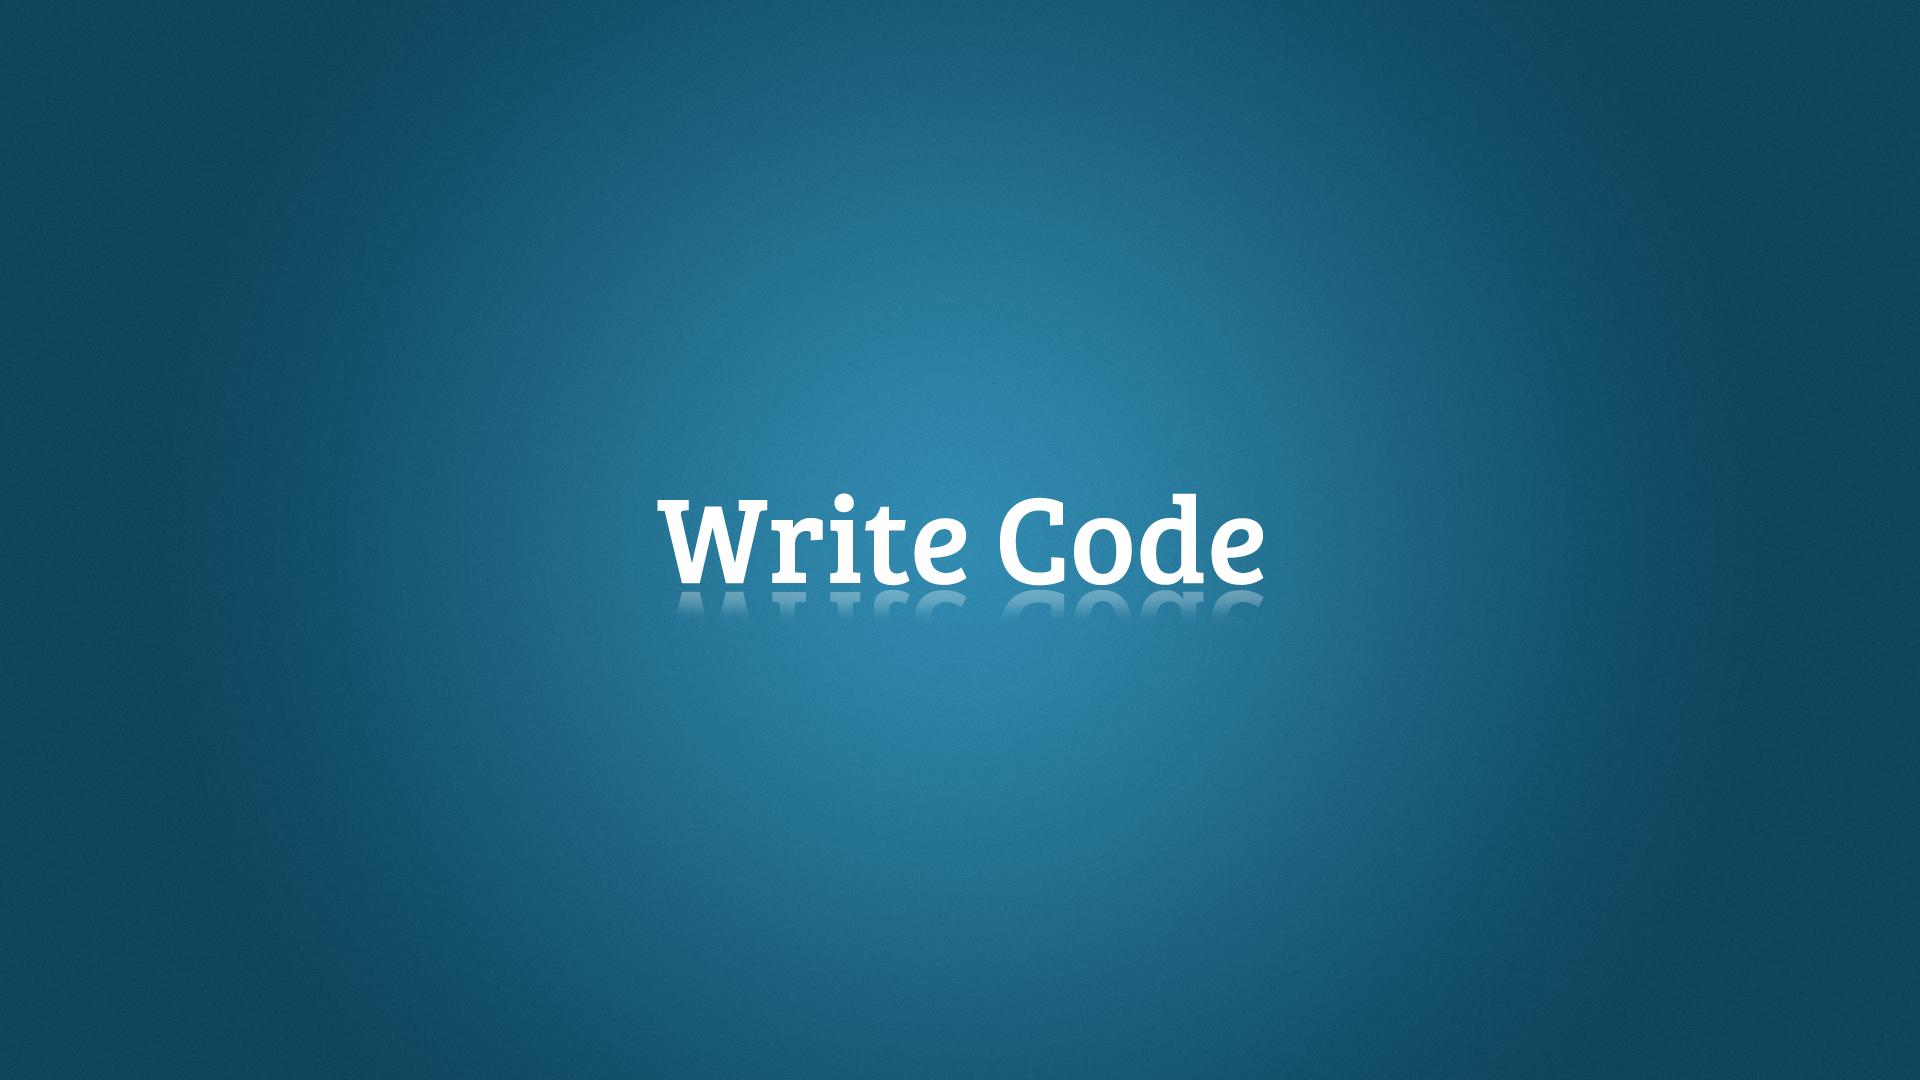 37 Programmer Code Wallpaper Backgrounds Download 1920x1080